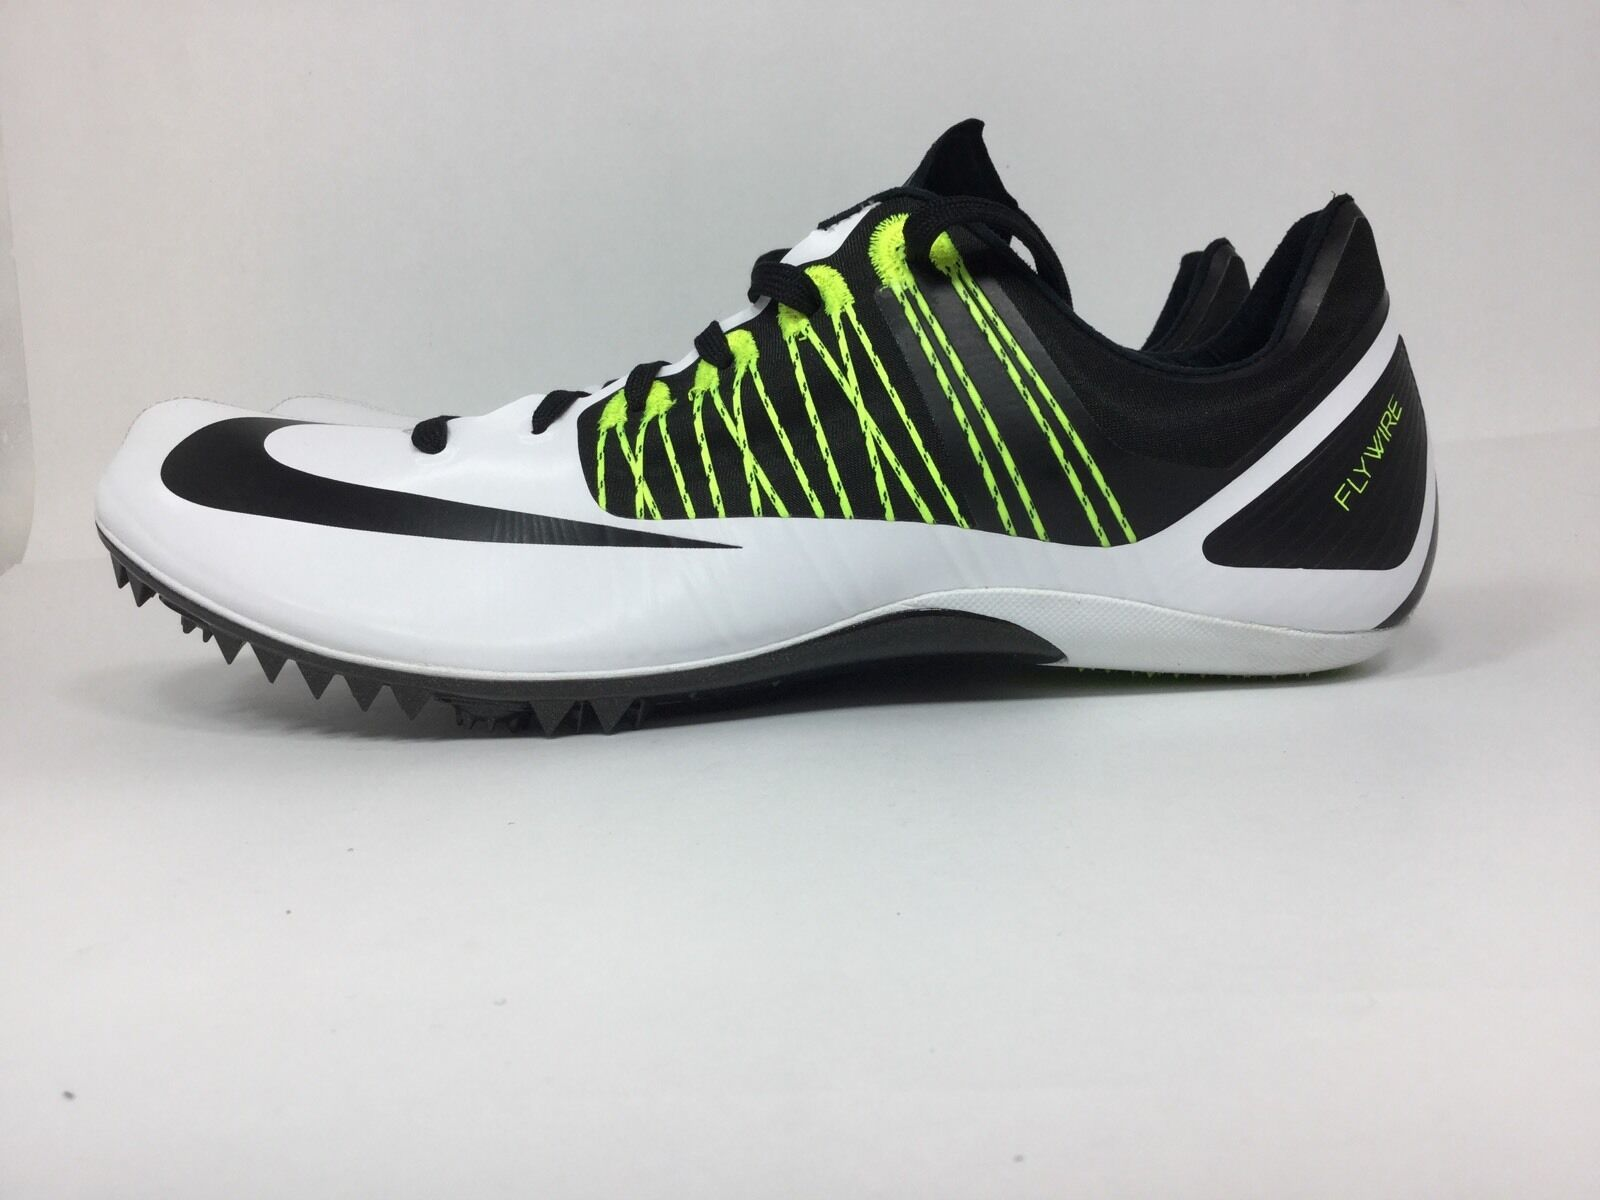 Nike zoom celar celar celar 5 punte track / 5 sprint scarpe bianche sz 15 a50254